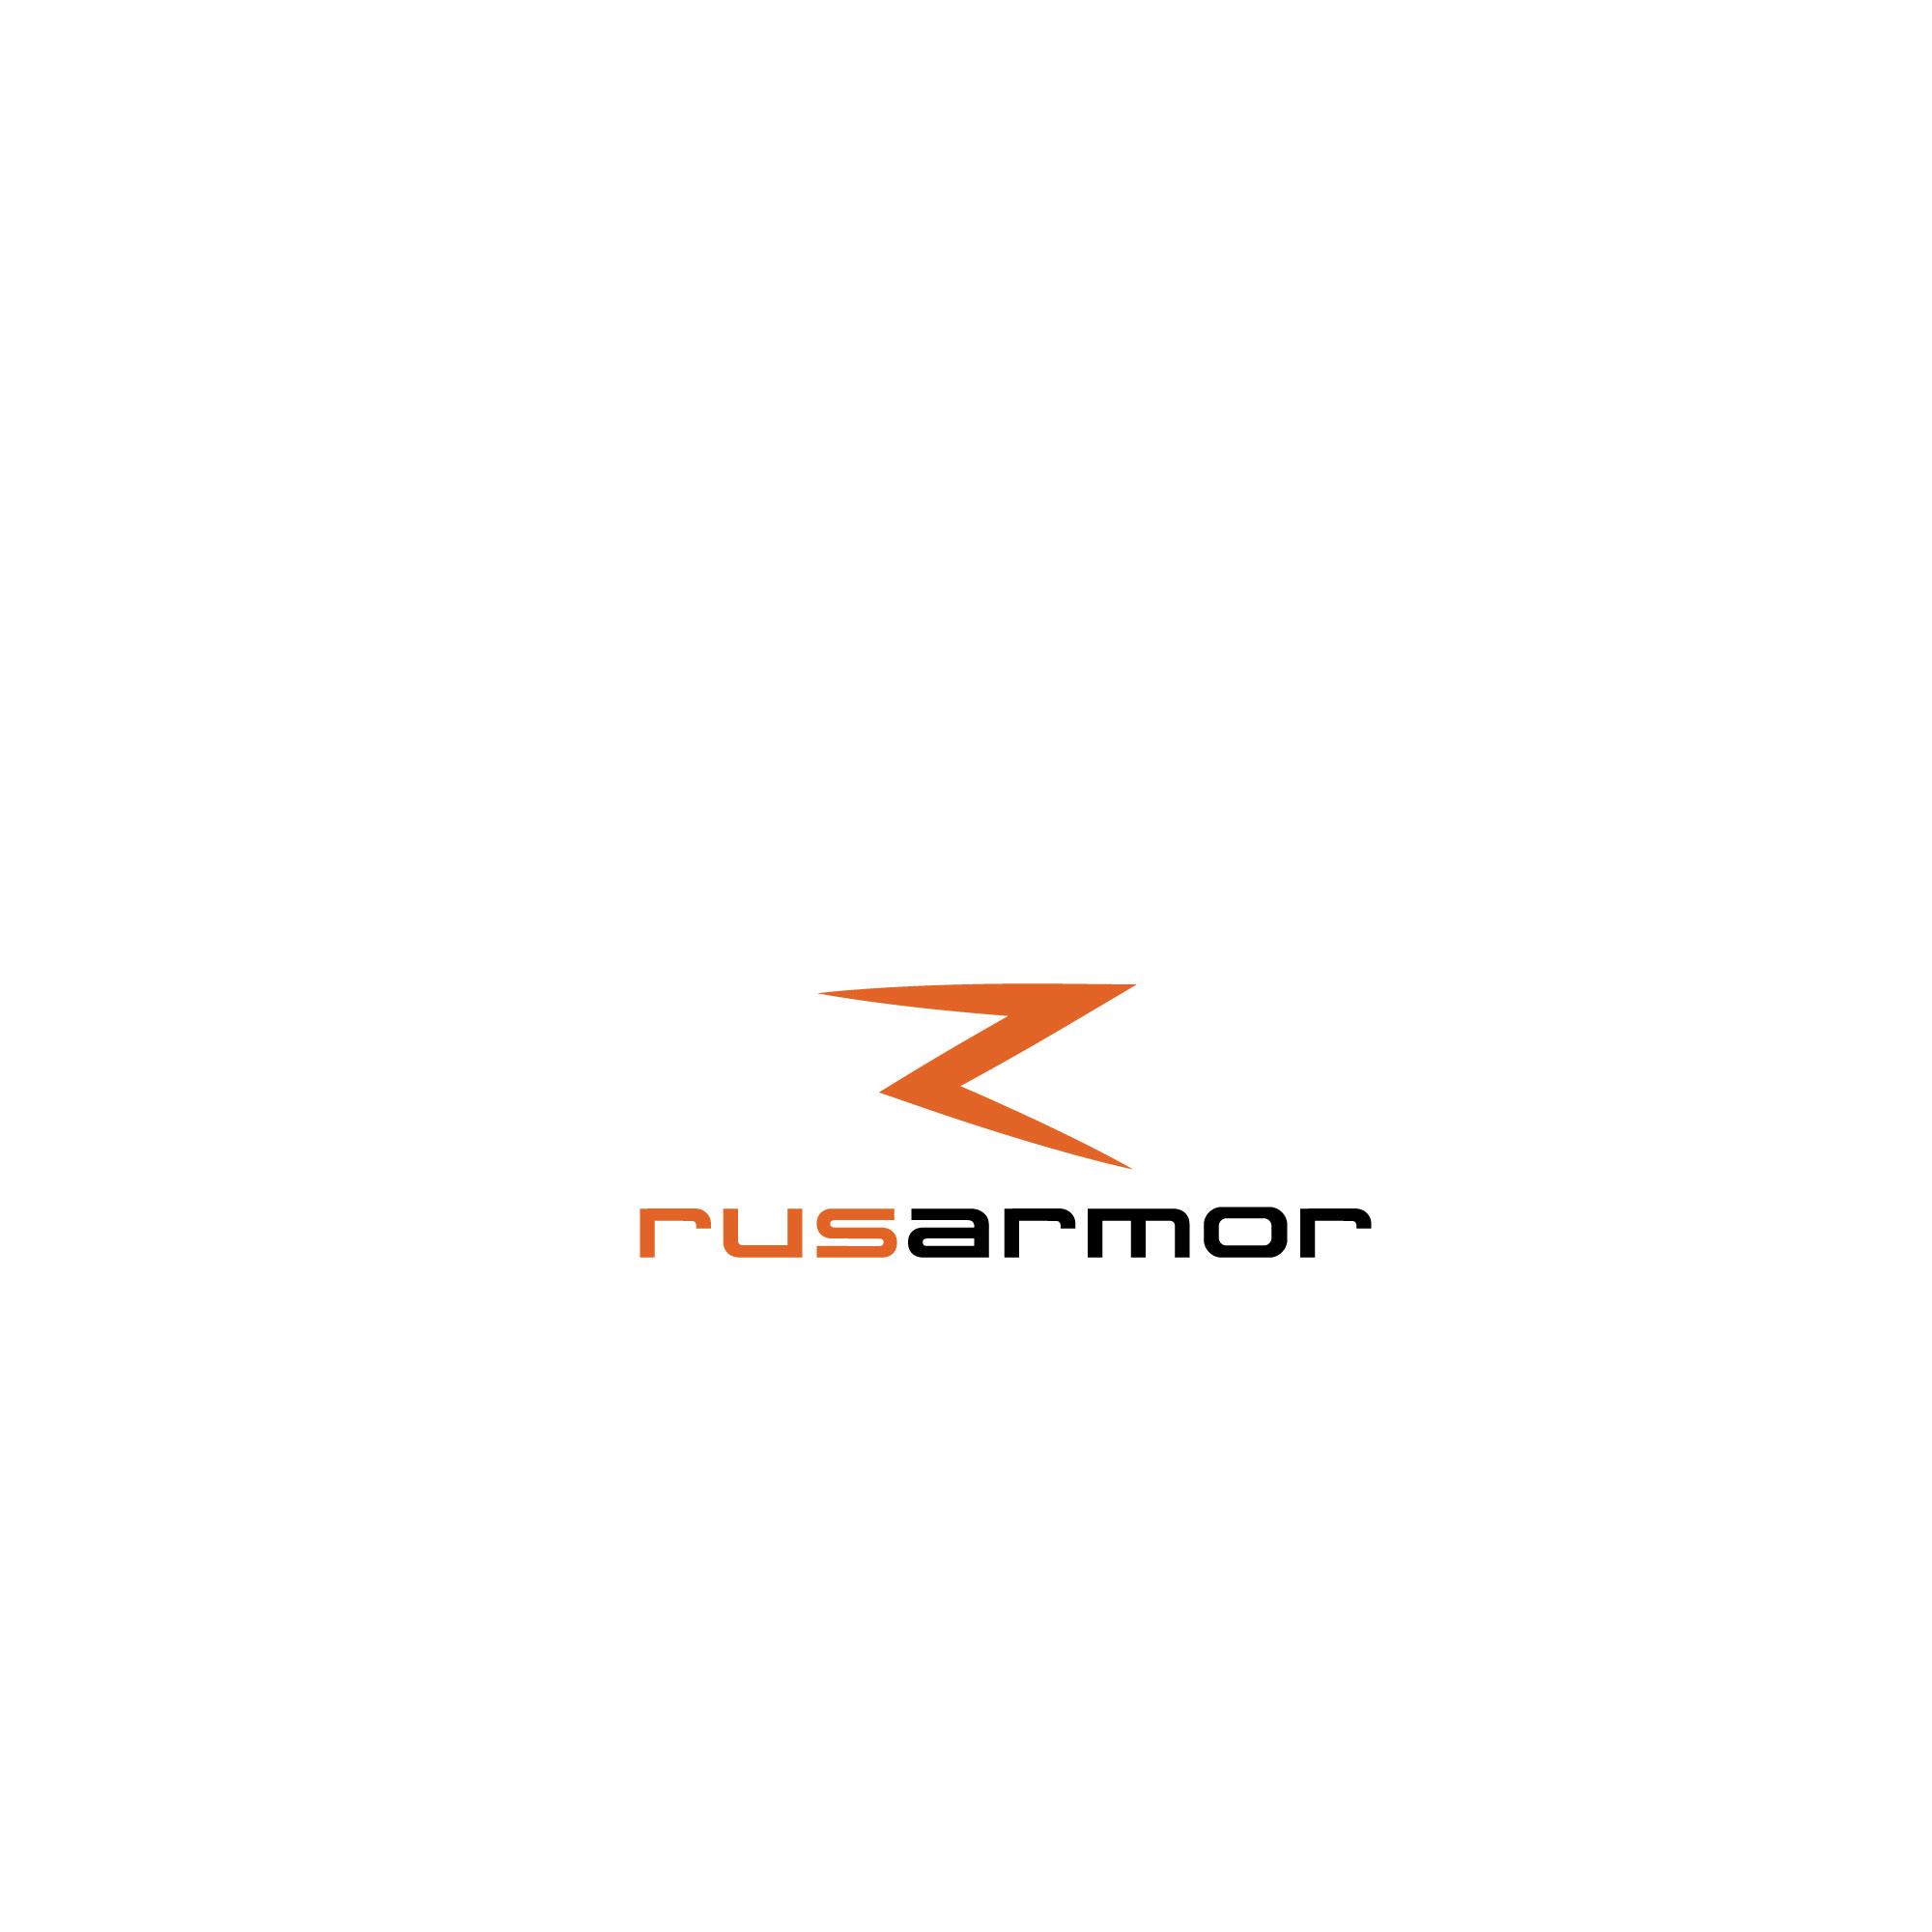 Разработка логотипа технологического стартапа РУСАРМОР фото f_7655a0aedd61f5ae.jpg